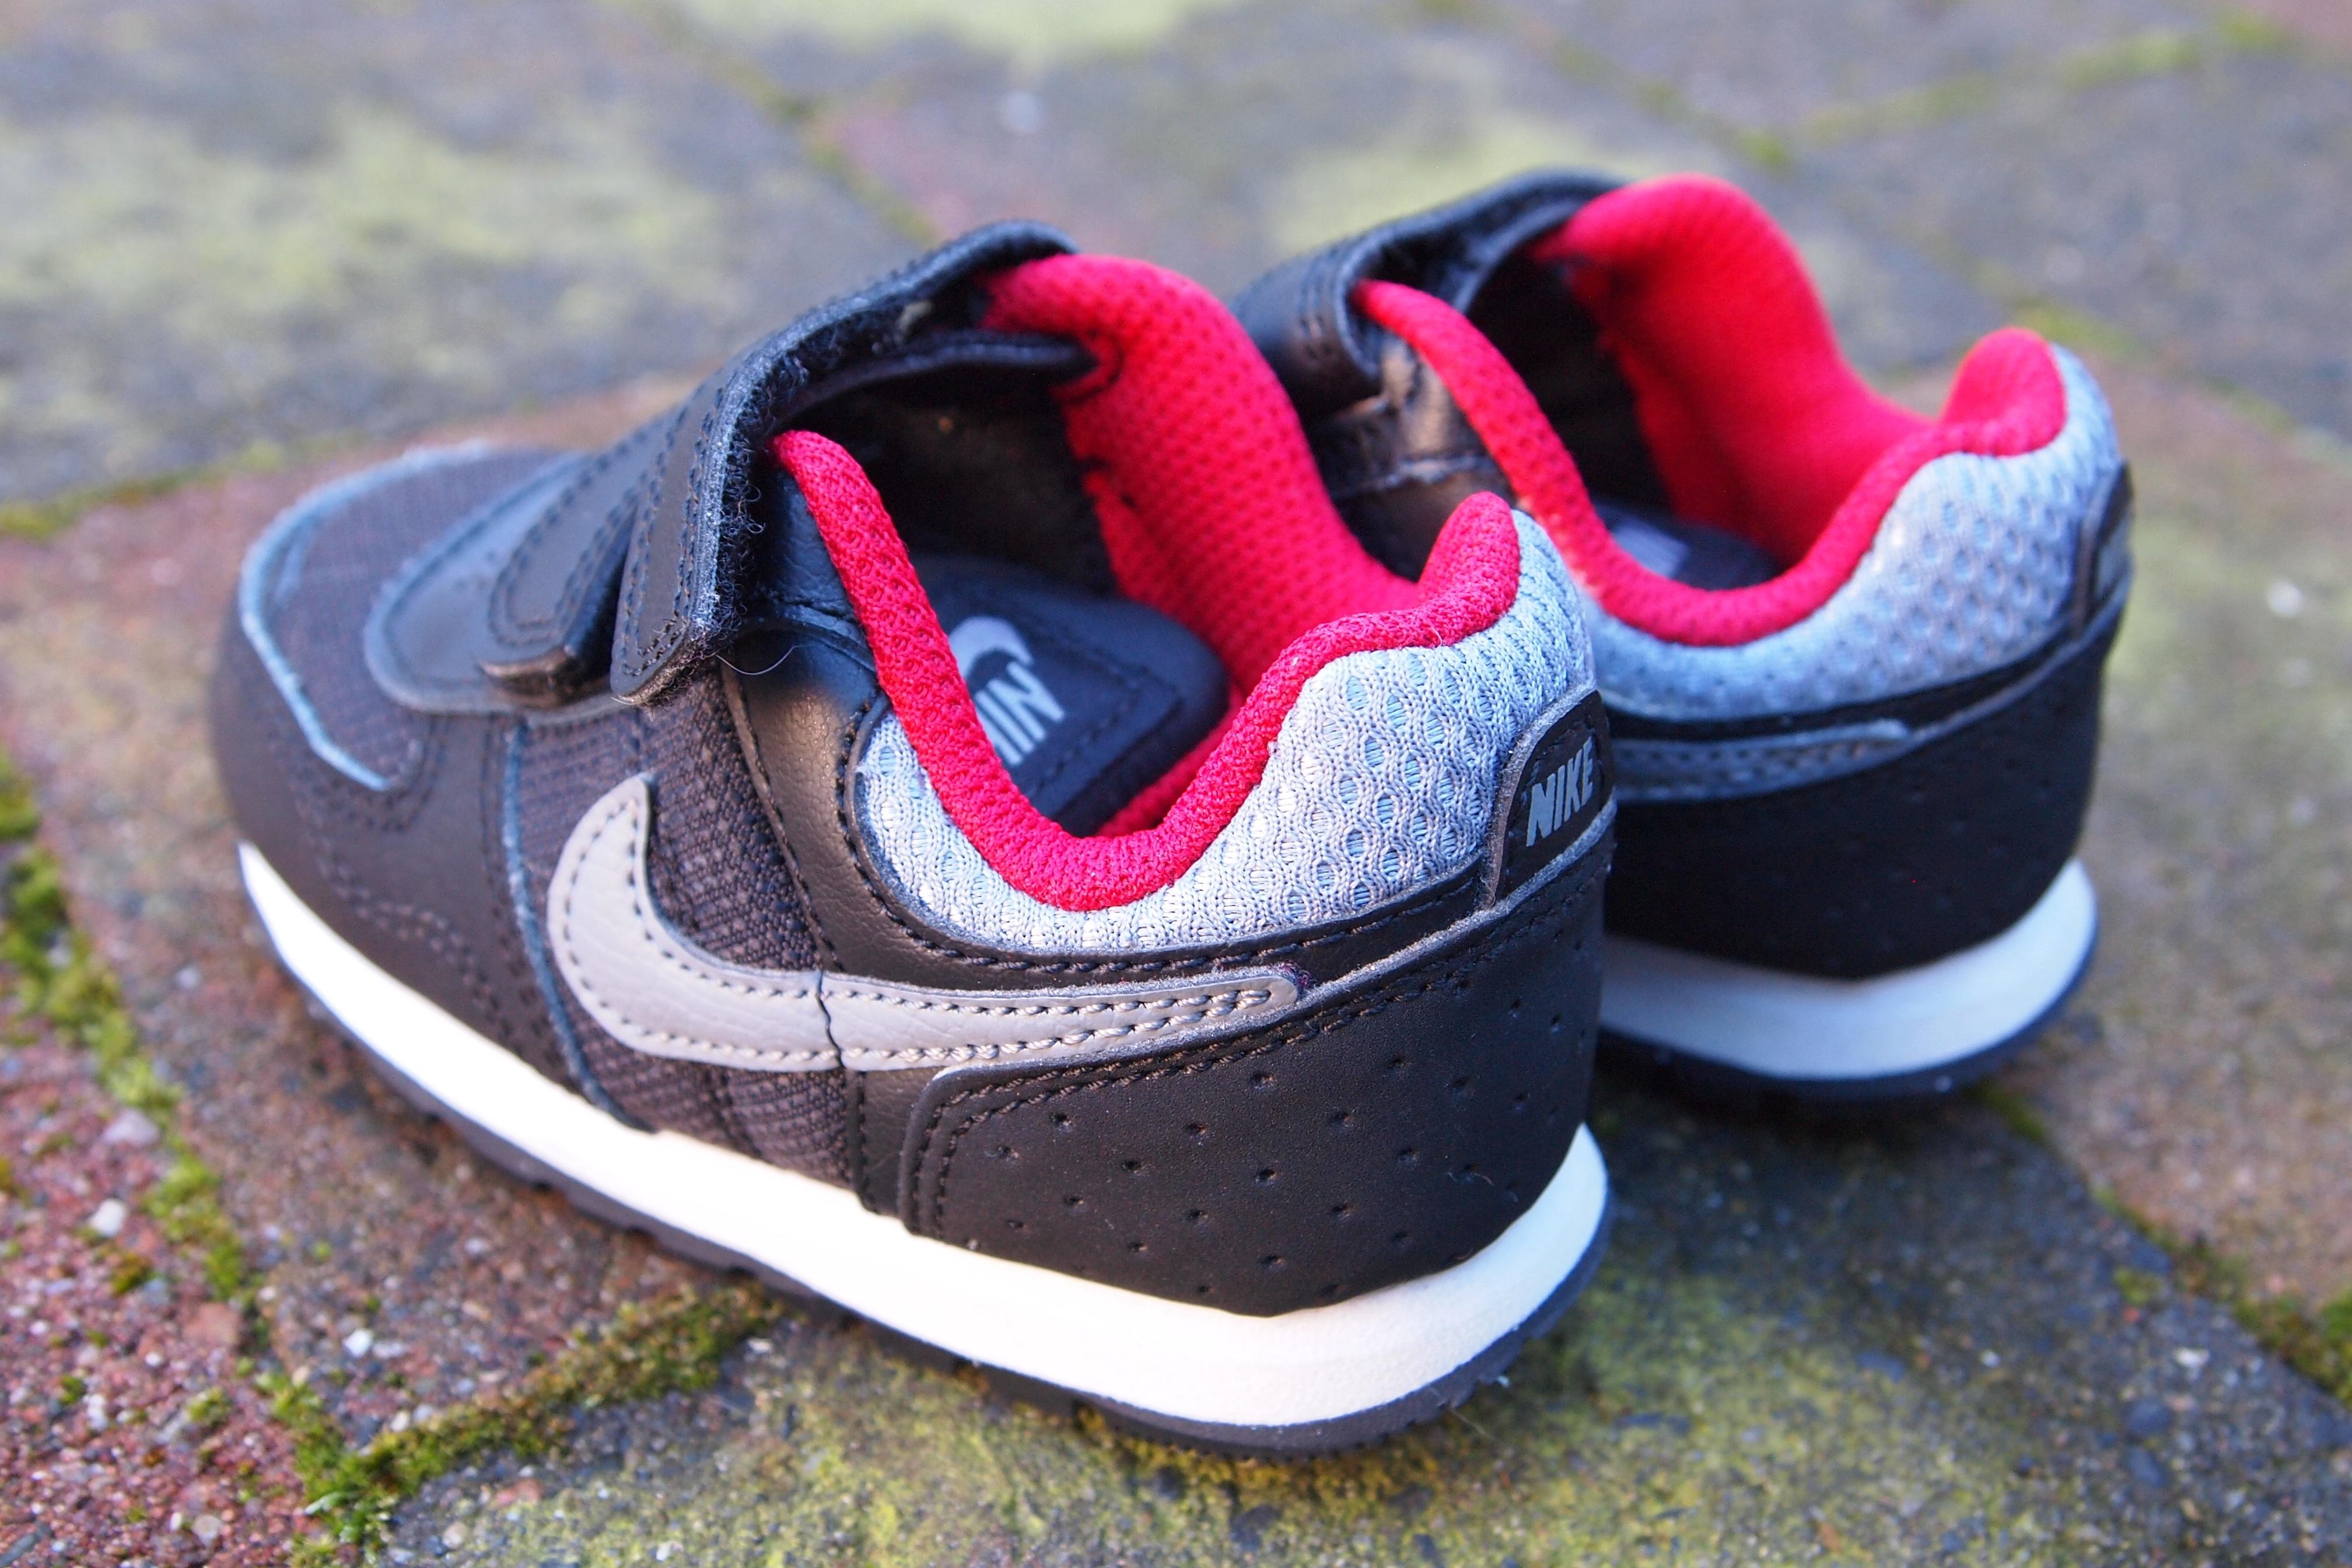 release date: 24ec9 b997b sko vandring röd svart rosa bebis gymnastikskor skodon kardborrband små skor  Nikes utomhus sko